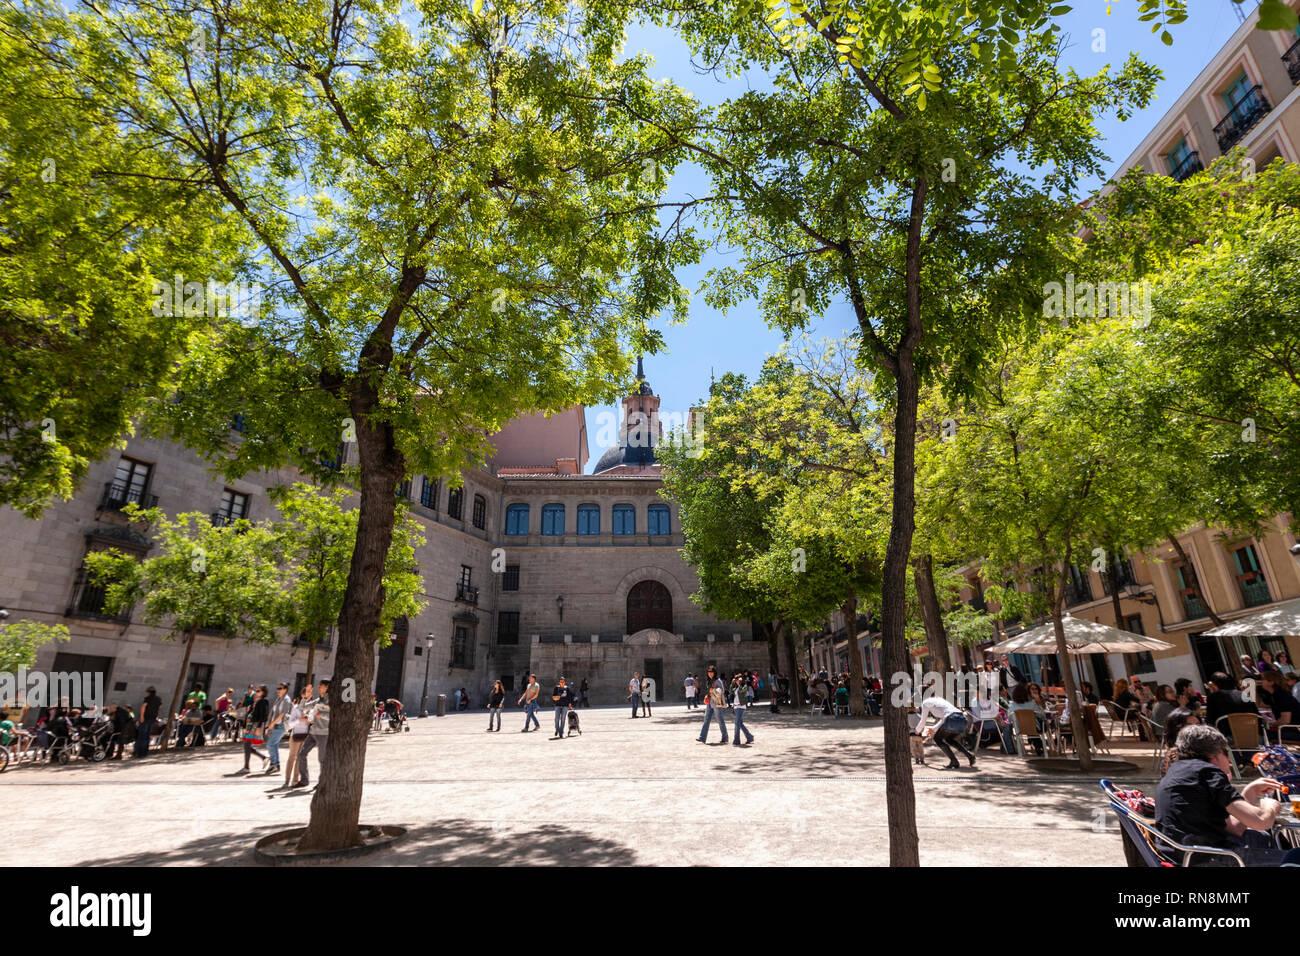 plaza-de-la-paja-madrid-spain-RN8MMT.jpg